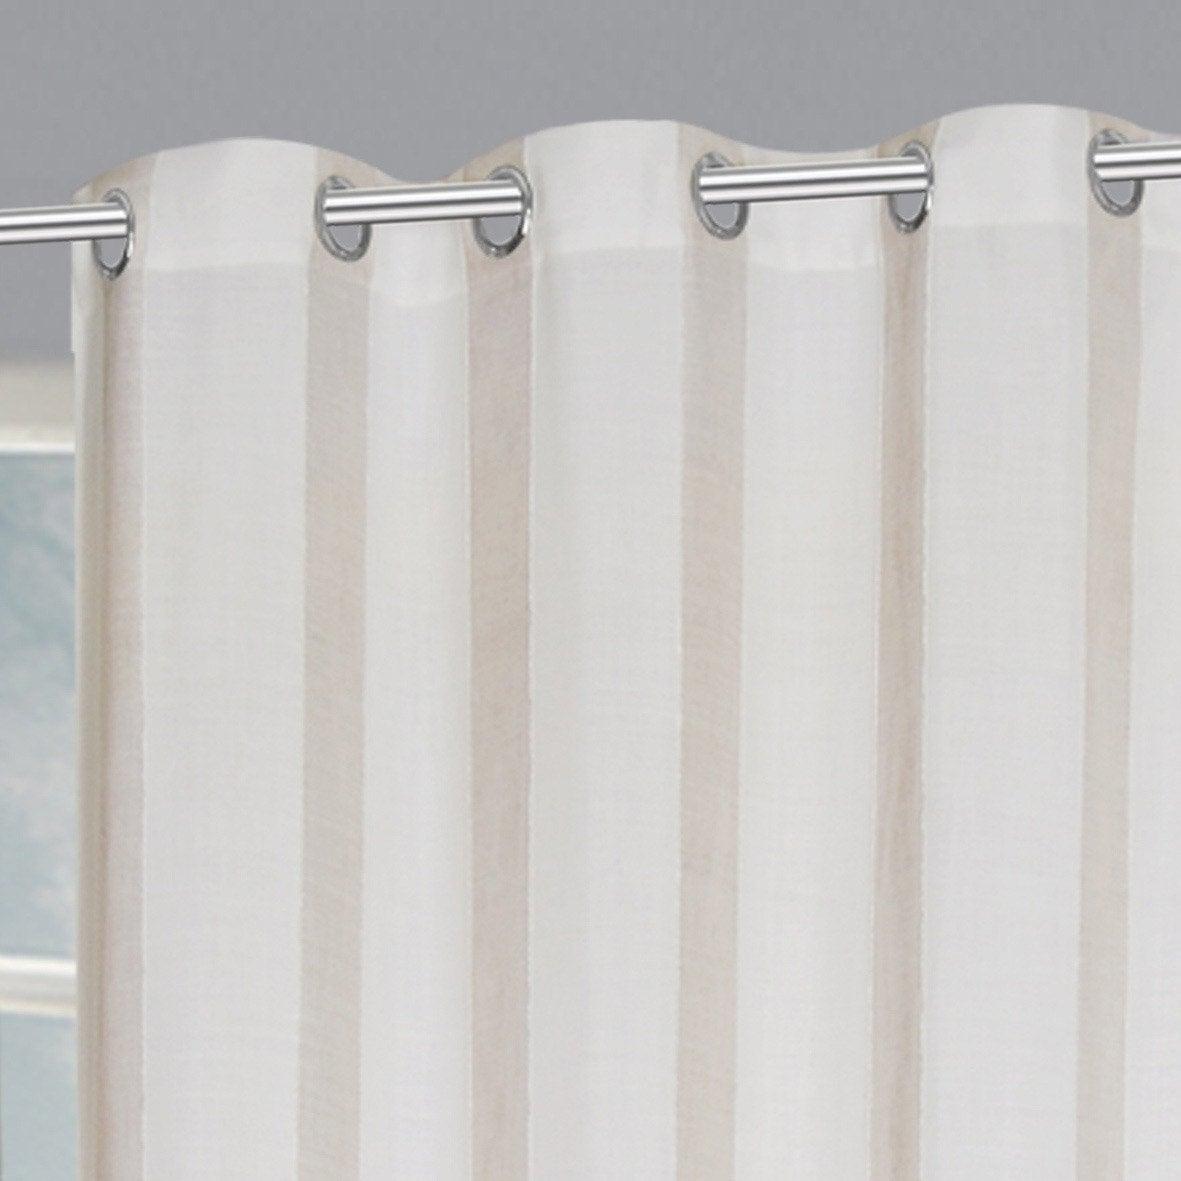 Rideau transparent, Madina banc/beige l.140 x H.260 cm